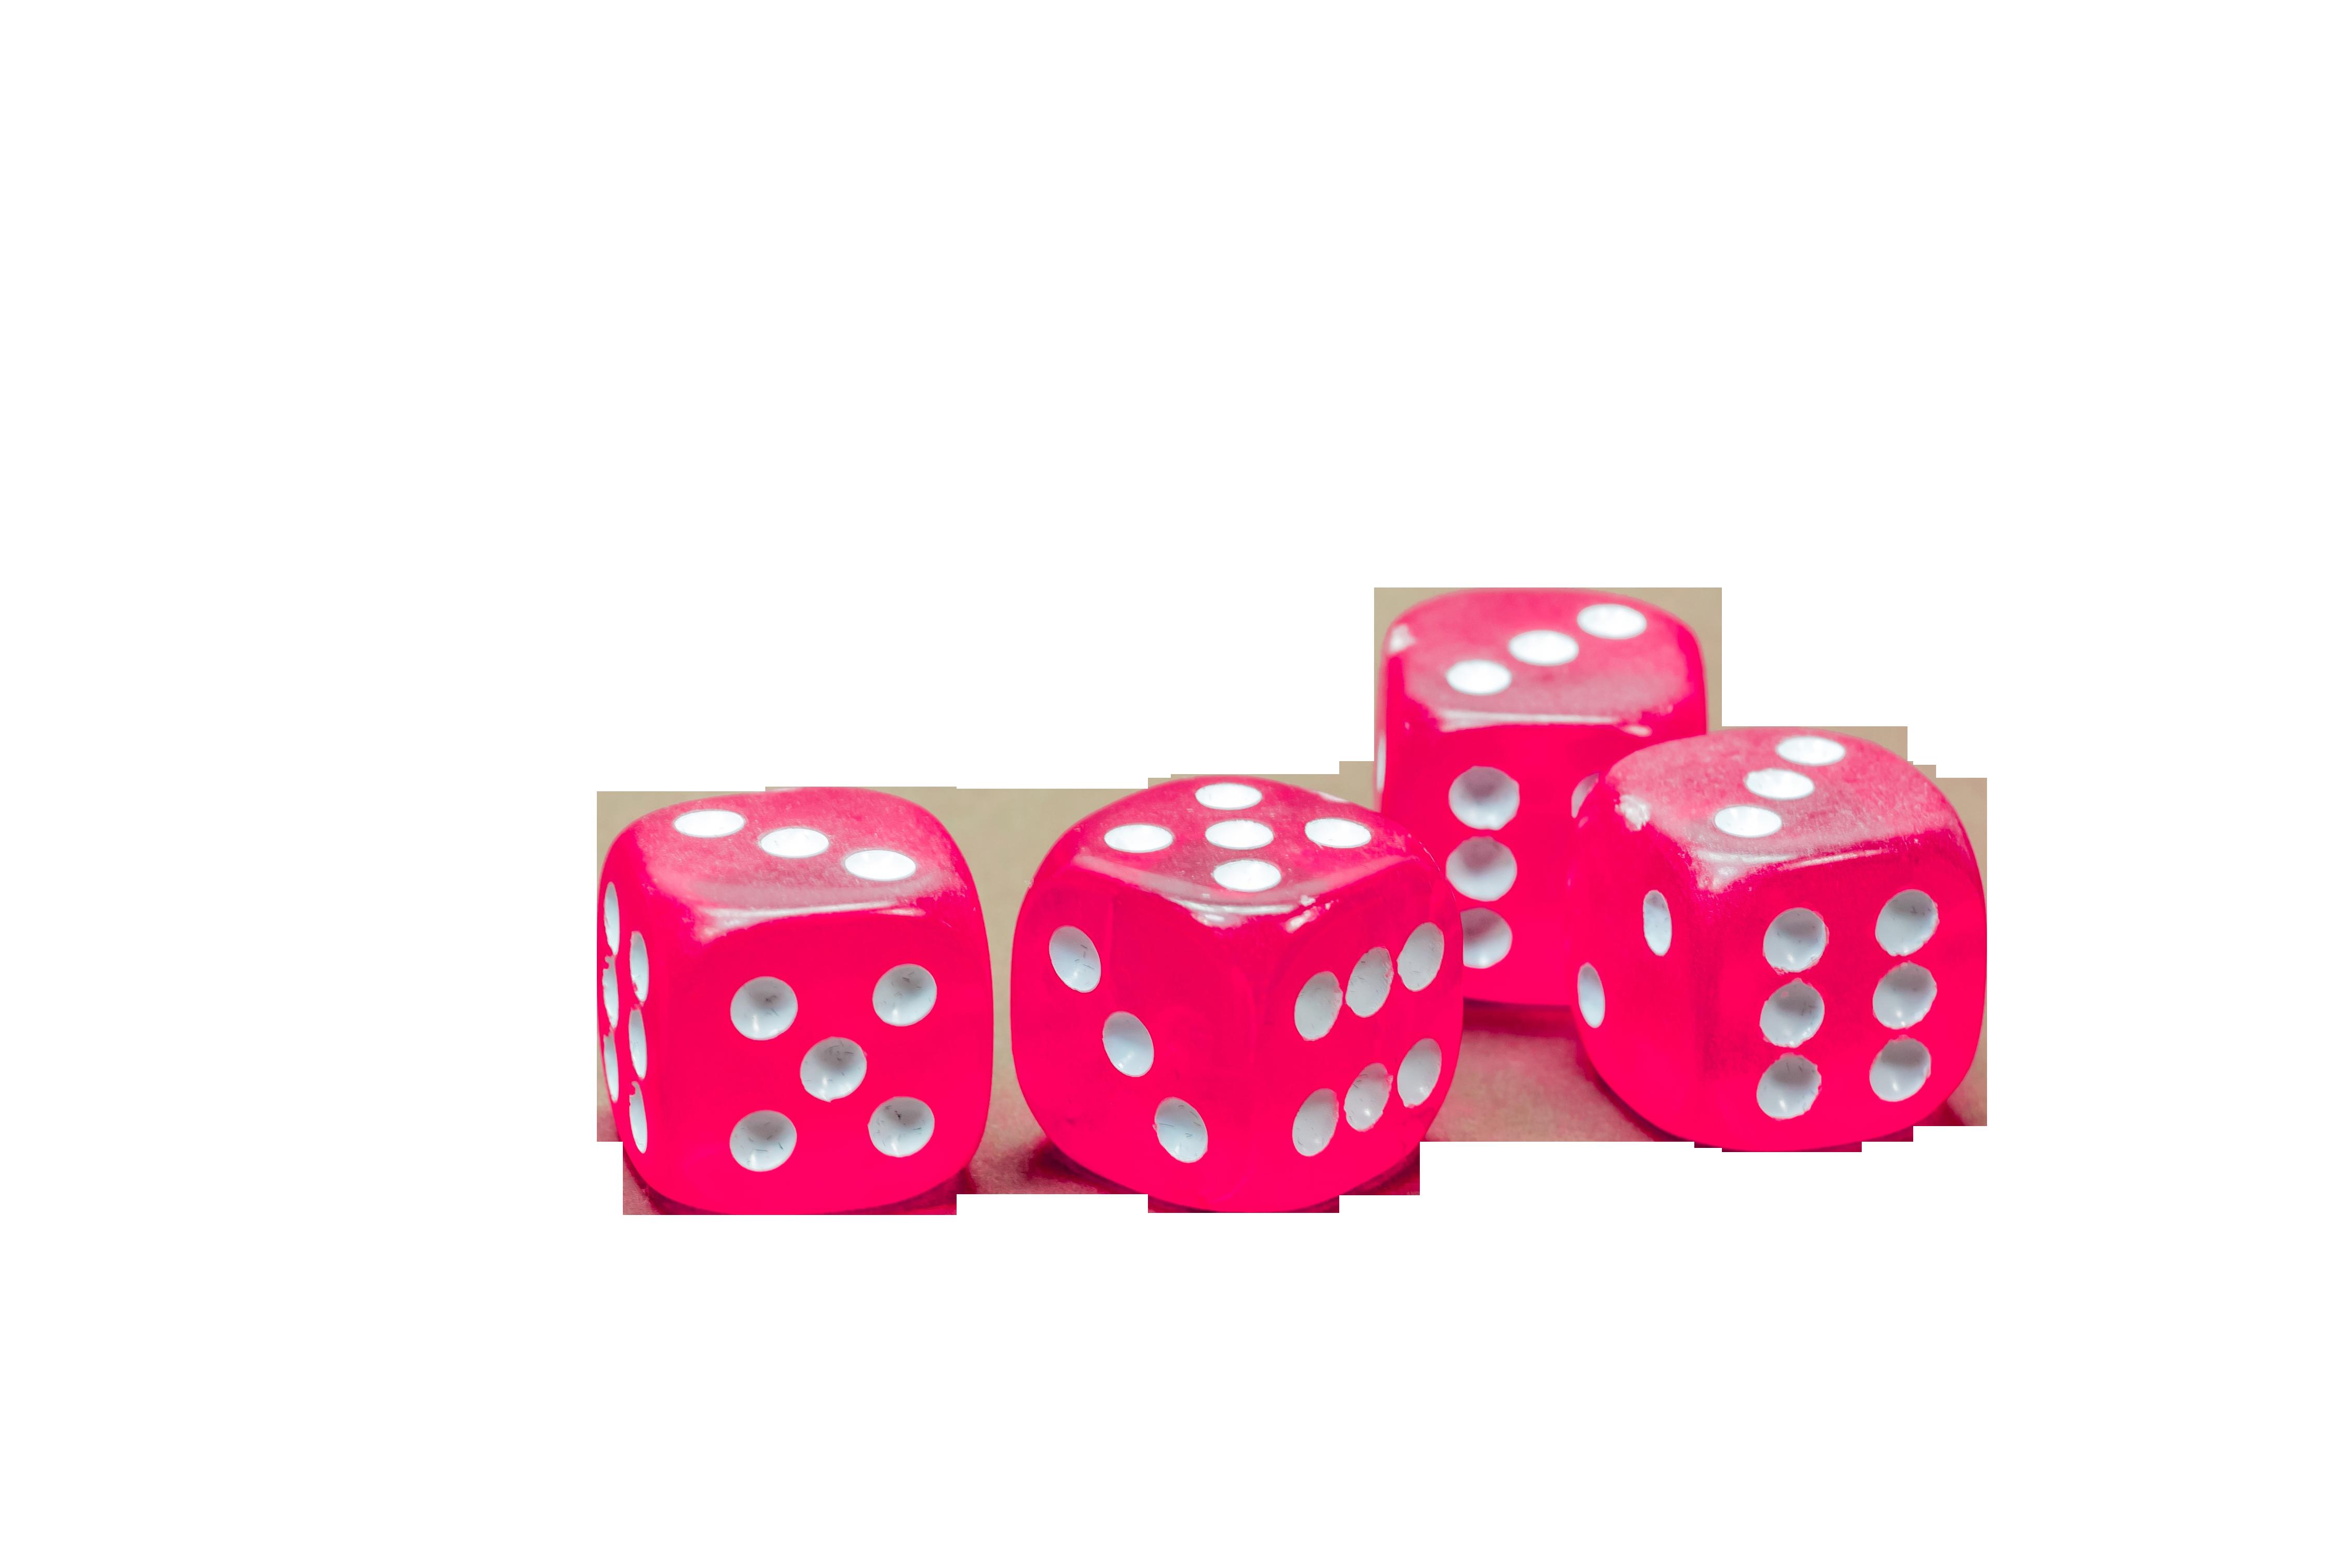 cube-568188_Clip